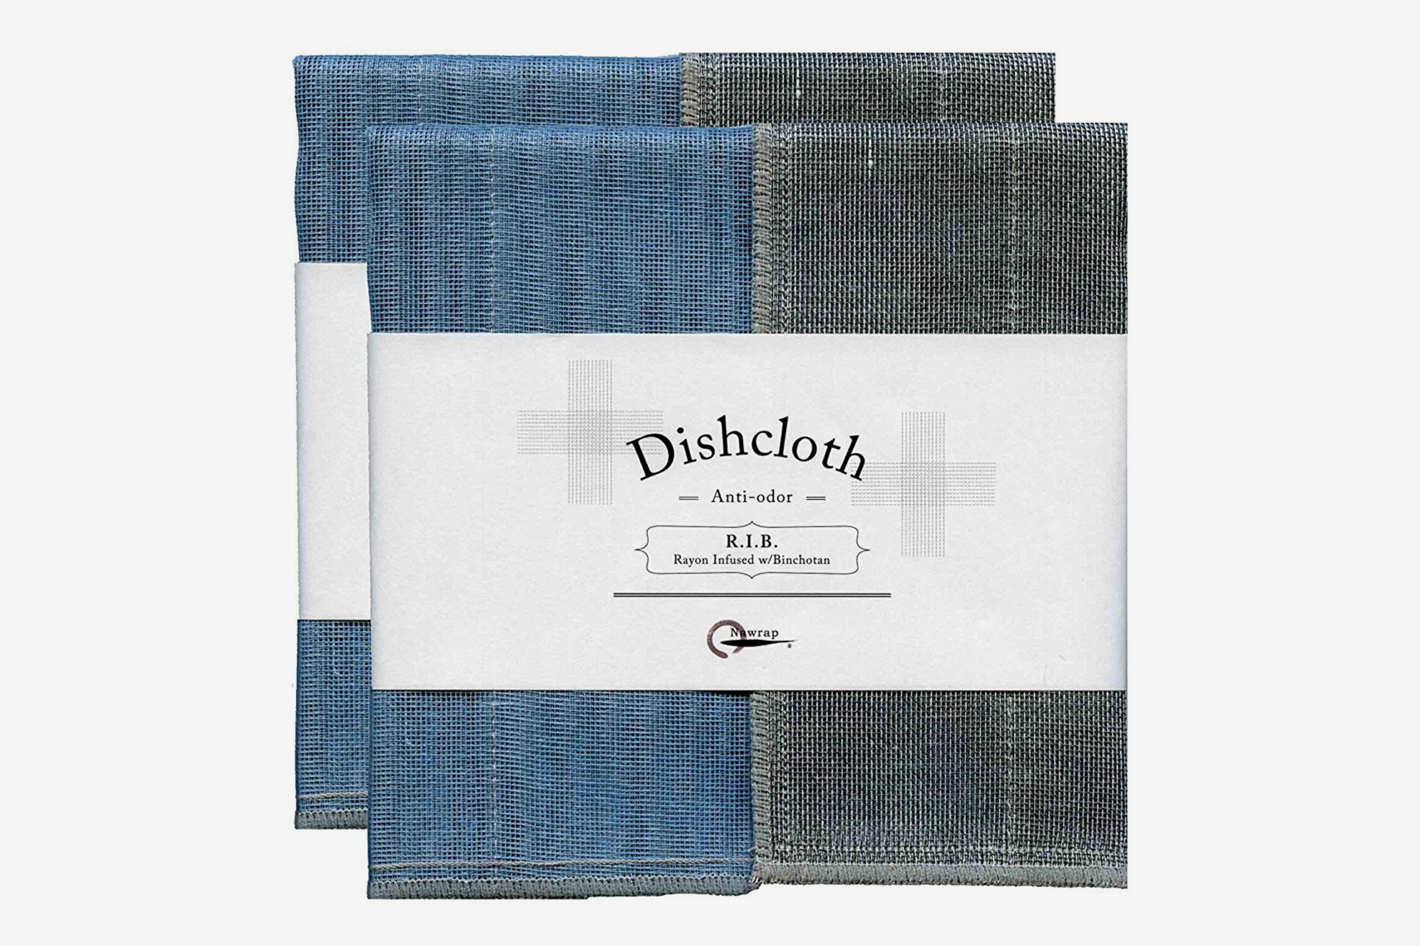 Nawrap Binchotan Dishcloths, 2 Pack